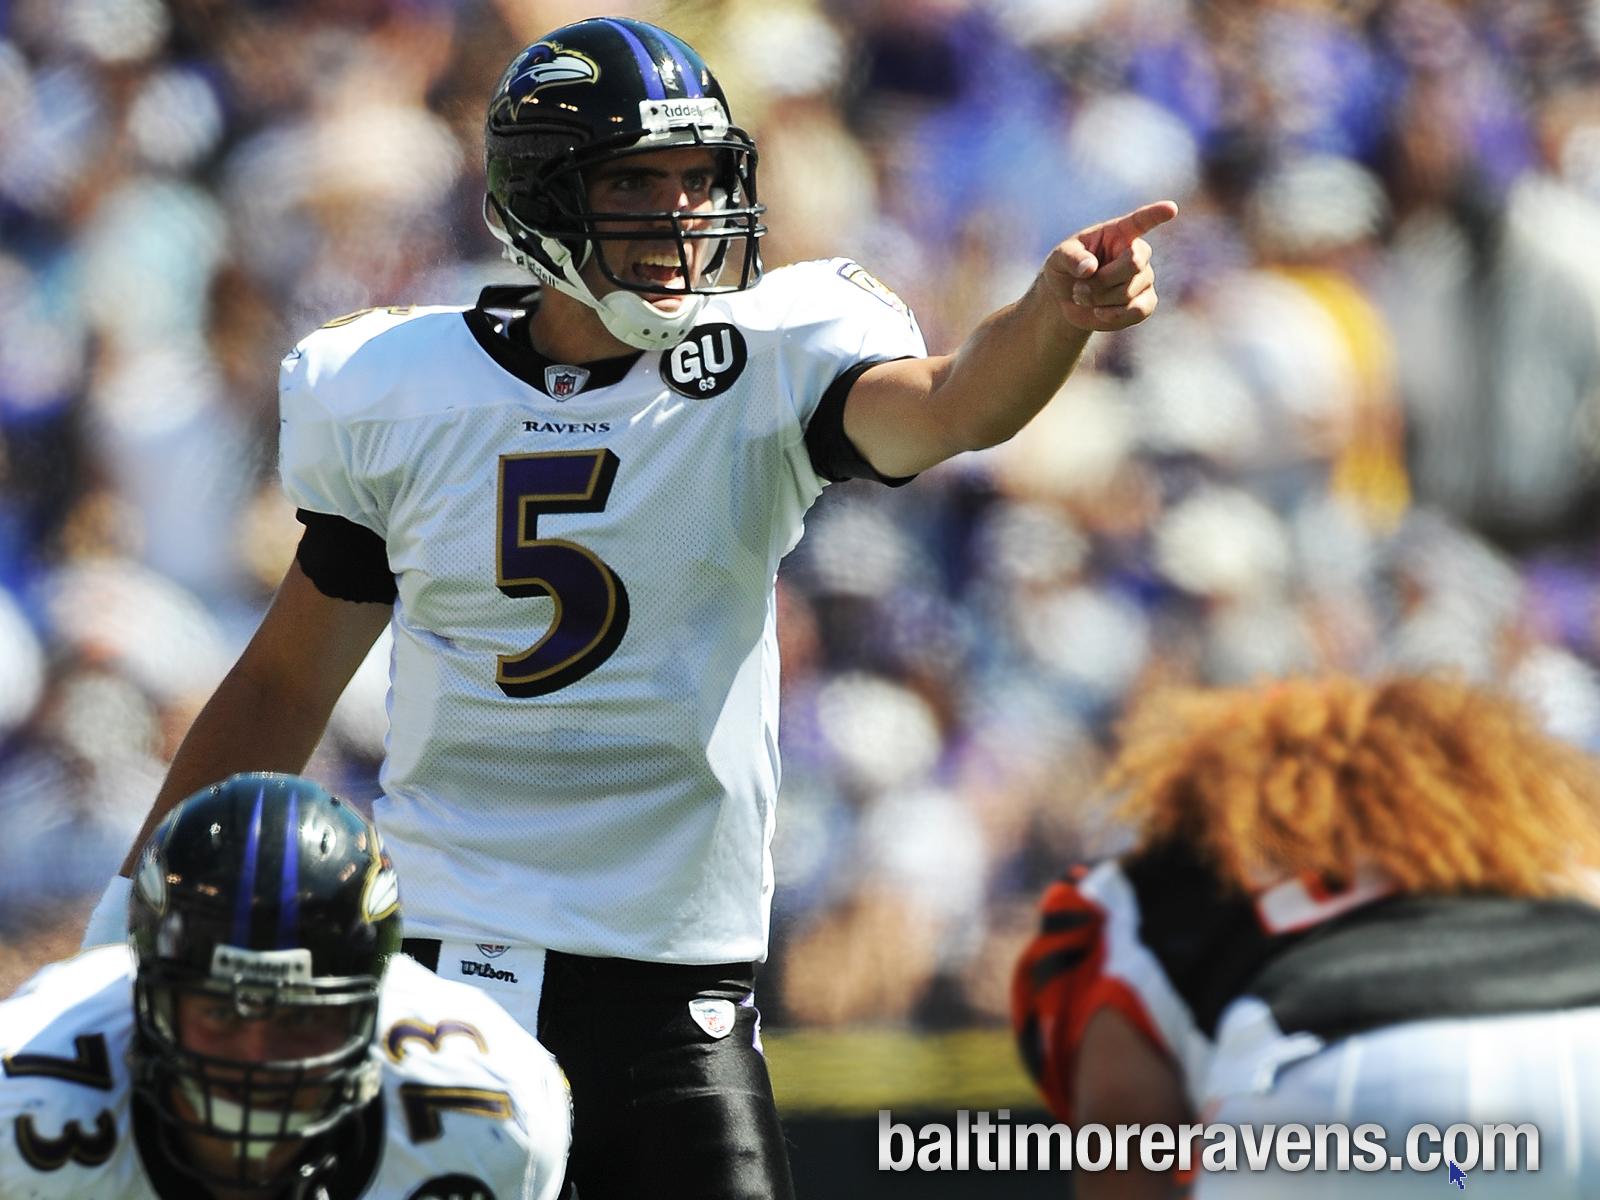 Download Baltimore Ravens Background For Desktops Hd Wallpaper 1600x1200